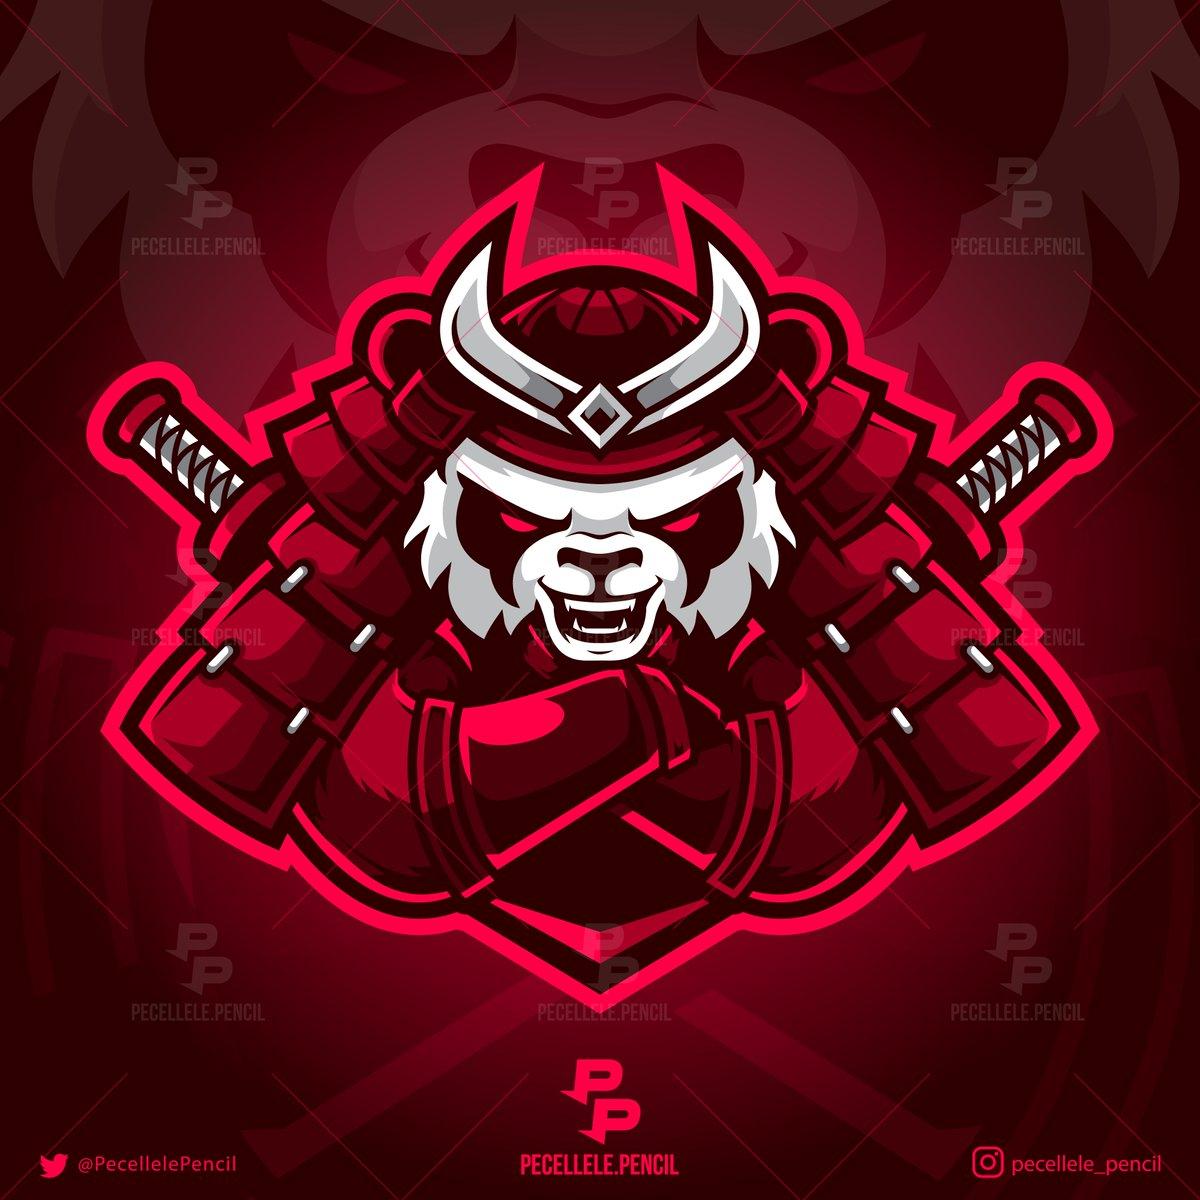 Samurai Panda  Low price (non-exclusive) logo design. you can buy at adobe stock :  https://stock.adobe.com/stock-photo/id/244779366…  @FEAR_RTs @SGH_RTs @SupStreamers @BlazedRTs @FameRT @TwitchTVGaming @LaZy_RTs @FlyRts @TwitchTVOnline  #logodesign #twitch #mixer #fortnite #squadlogo #esports #gaminglogopic.twitter.com/P3HNBuiQCi